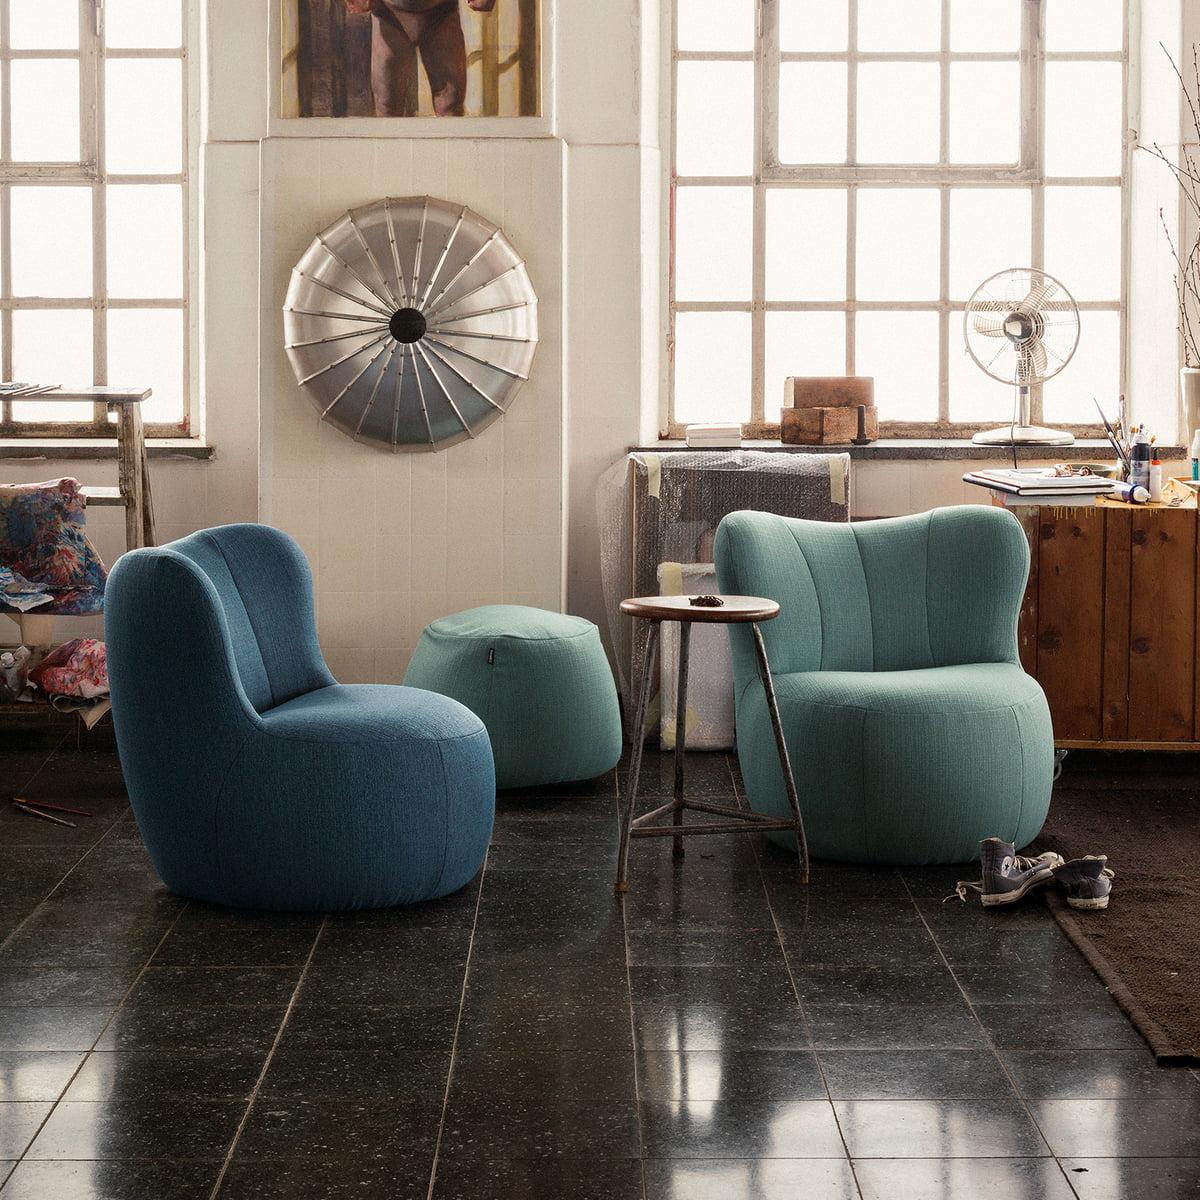 173 pouf von freistil connox. Black Bedroom Furniture Sets. Home Design Ideas